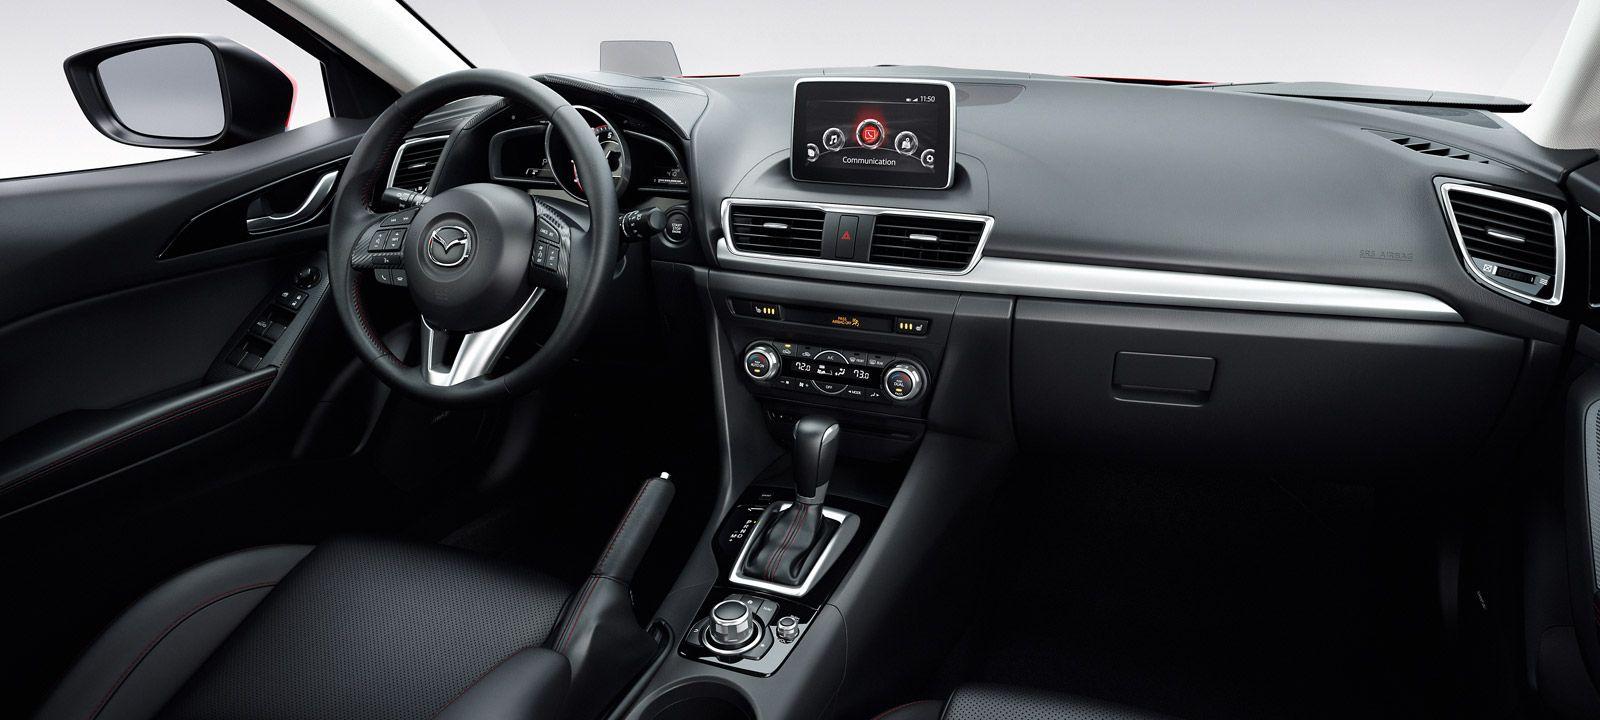 Interior 2015 Mazda 3 Hatchback Specs, Price U0026 Release Date